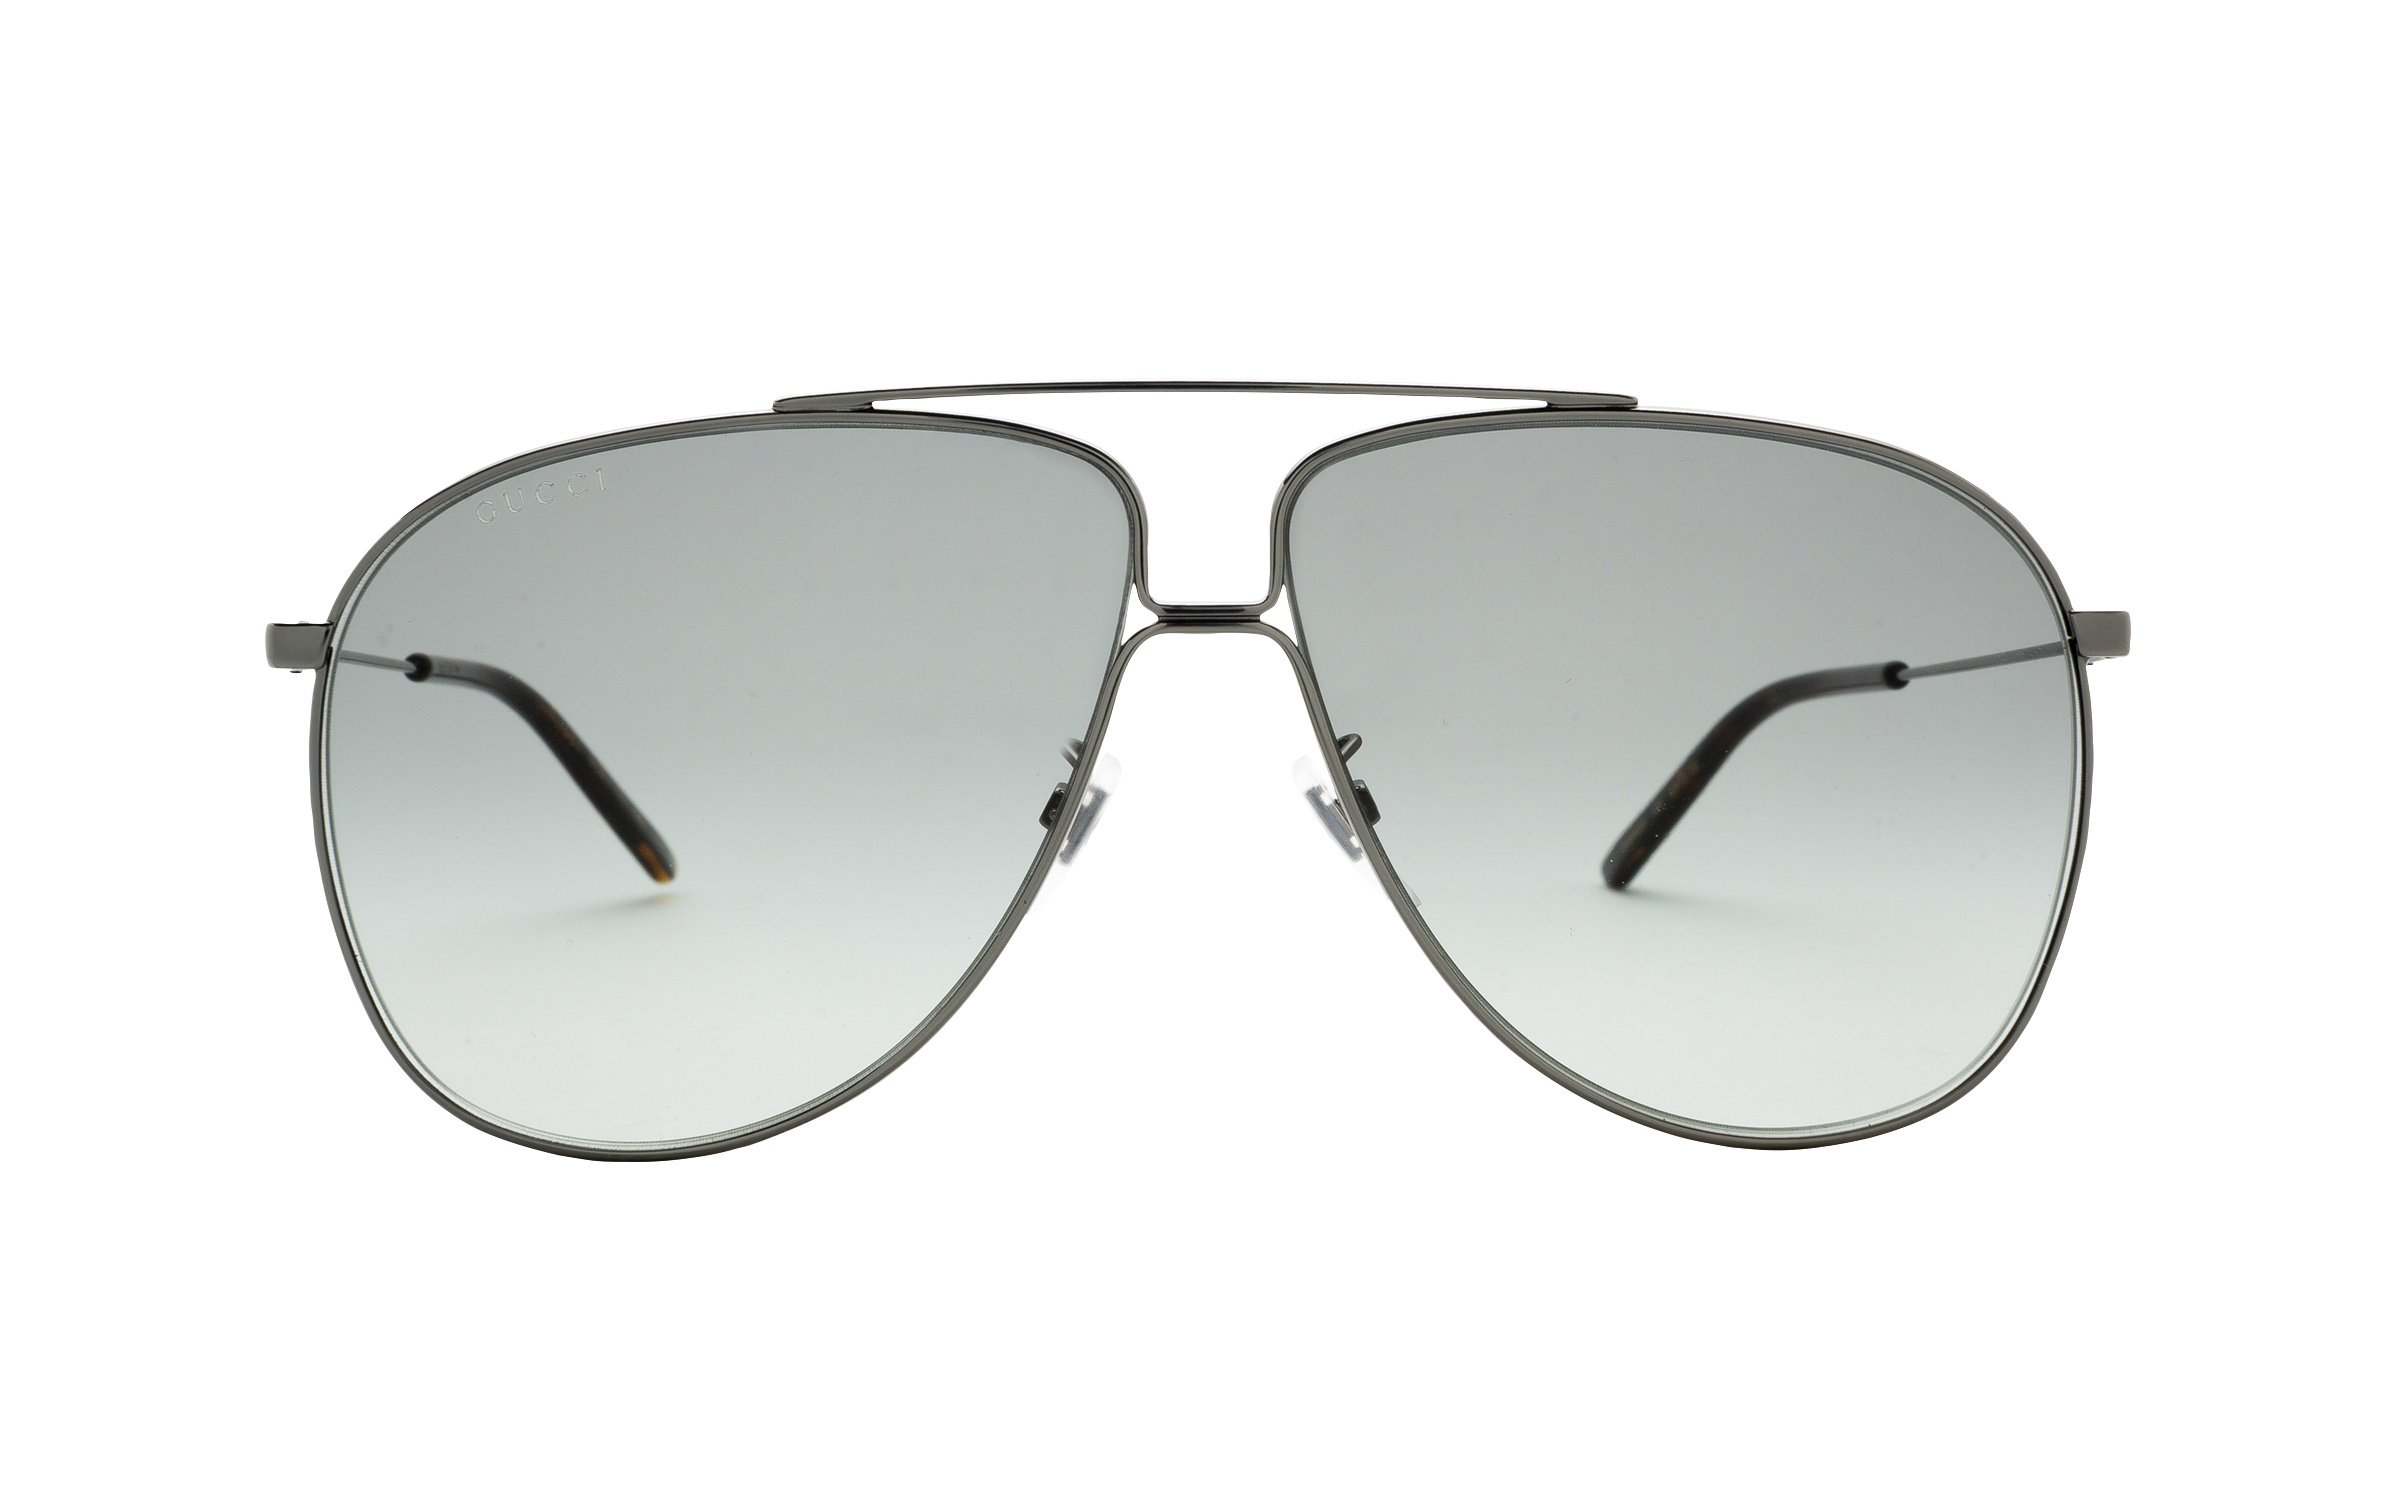 http://www.coastal.com/ - Gucci GG0440S 005 63 Sunglasses in Ruthenium Black | Acetate – Online Coastal